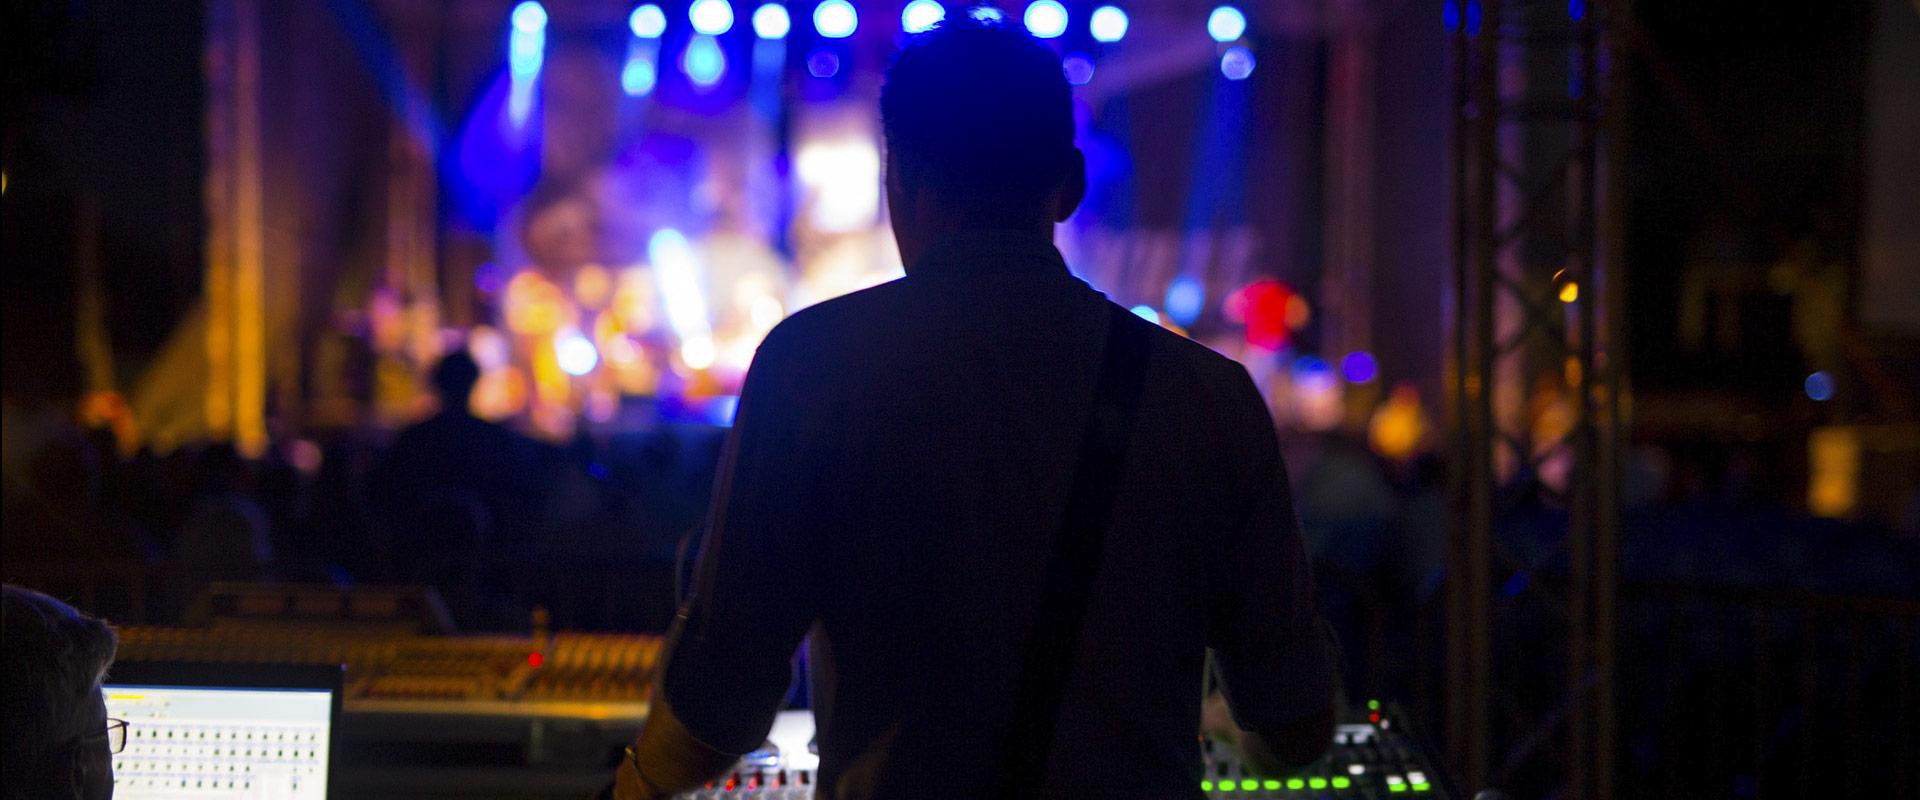 to-become-music-logo-jazz-manouche-stochelo-rosenberg-julien-cattiaux-costel-nitescu-noe-reinhardt-rocky-gresset-django-concert-visu-technicien-photo-2